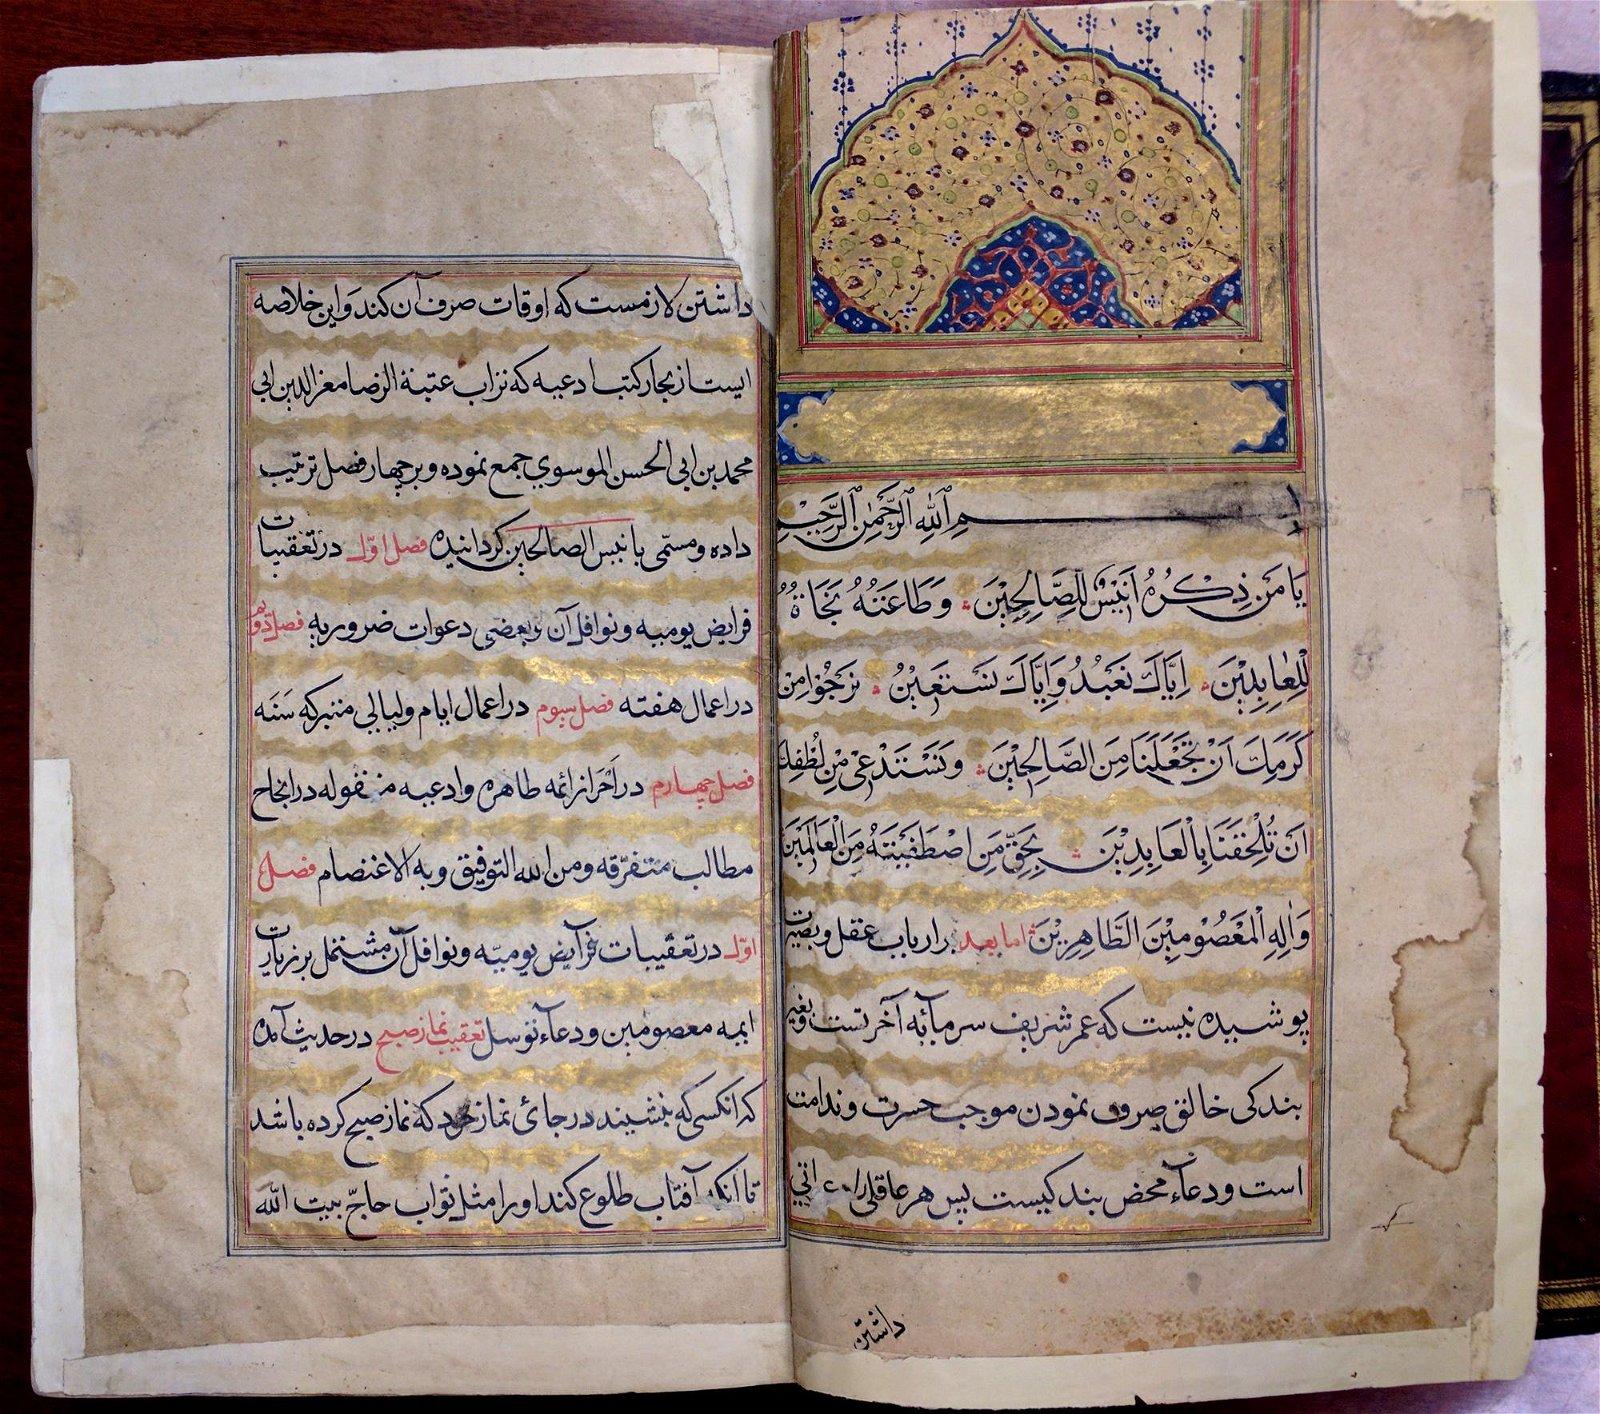 MUHAMMAD BAQIR IBN MUHAMMAD TAQI MAJLISI (D. AH